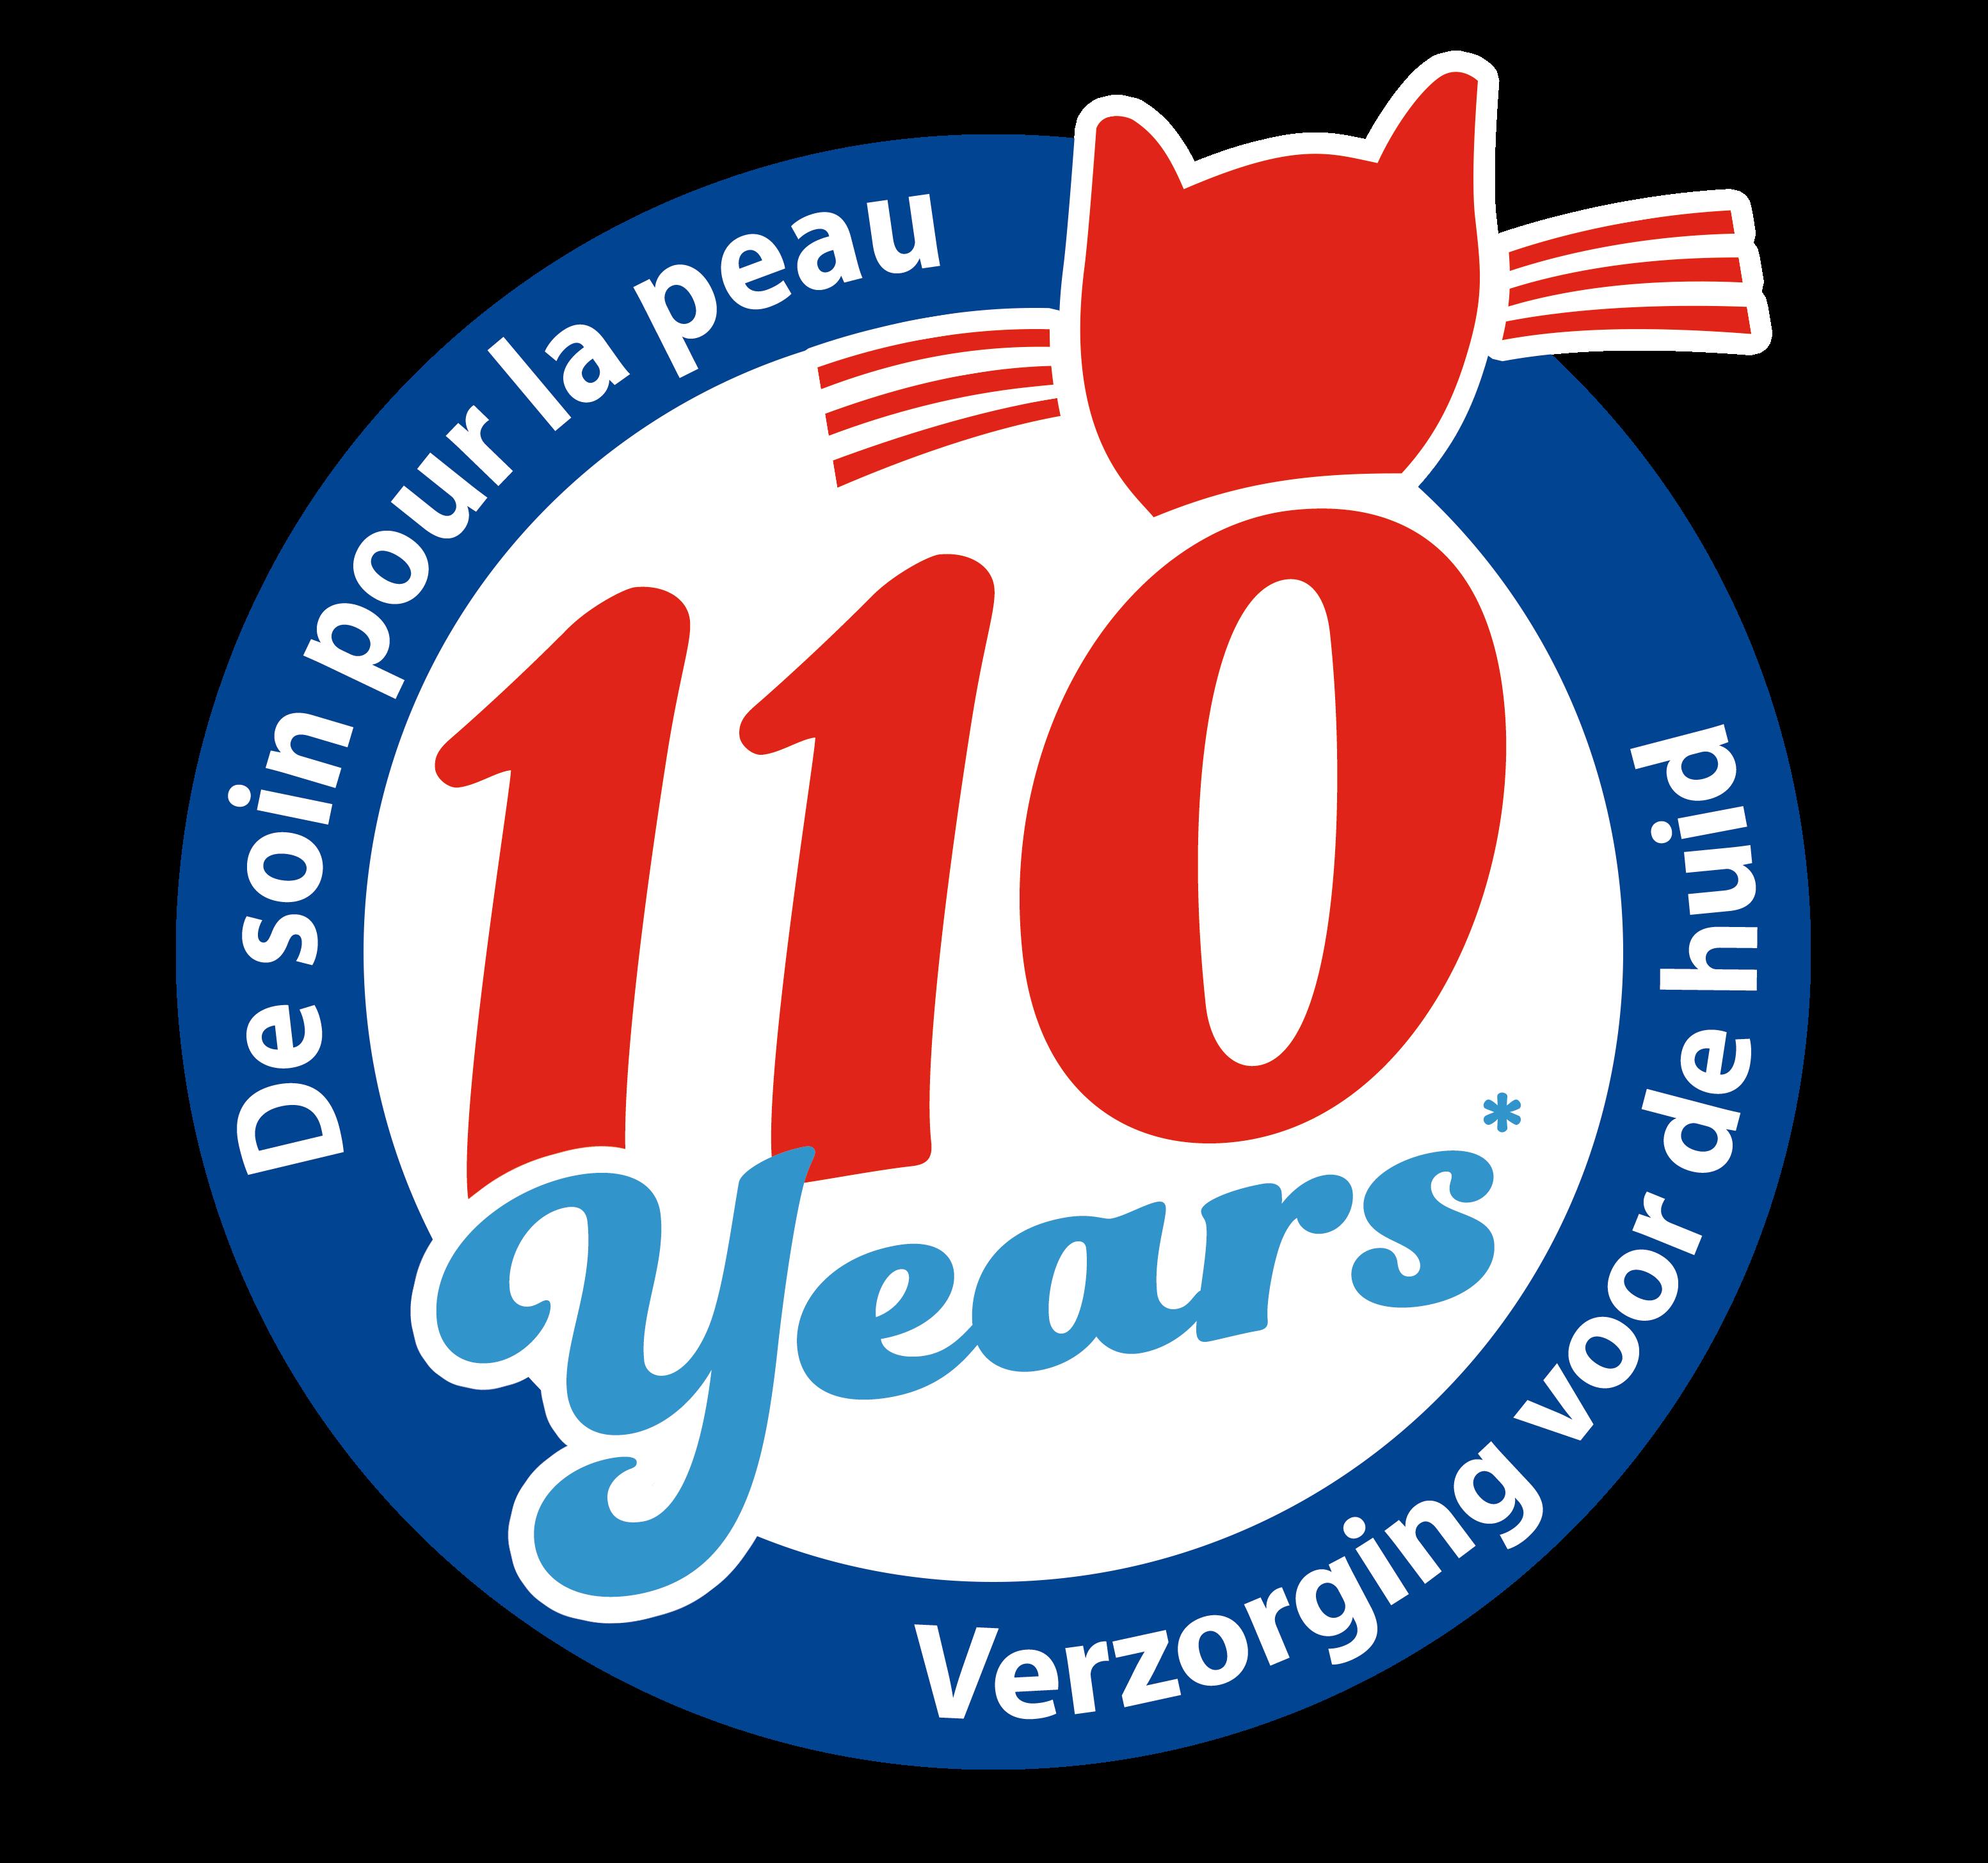 Logo van Le Chat wasmiddel 110 jaar